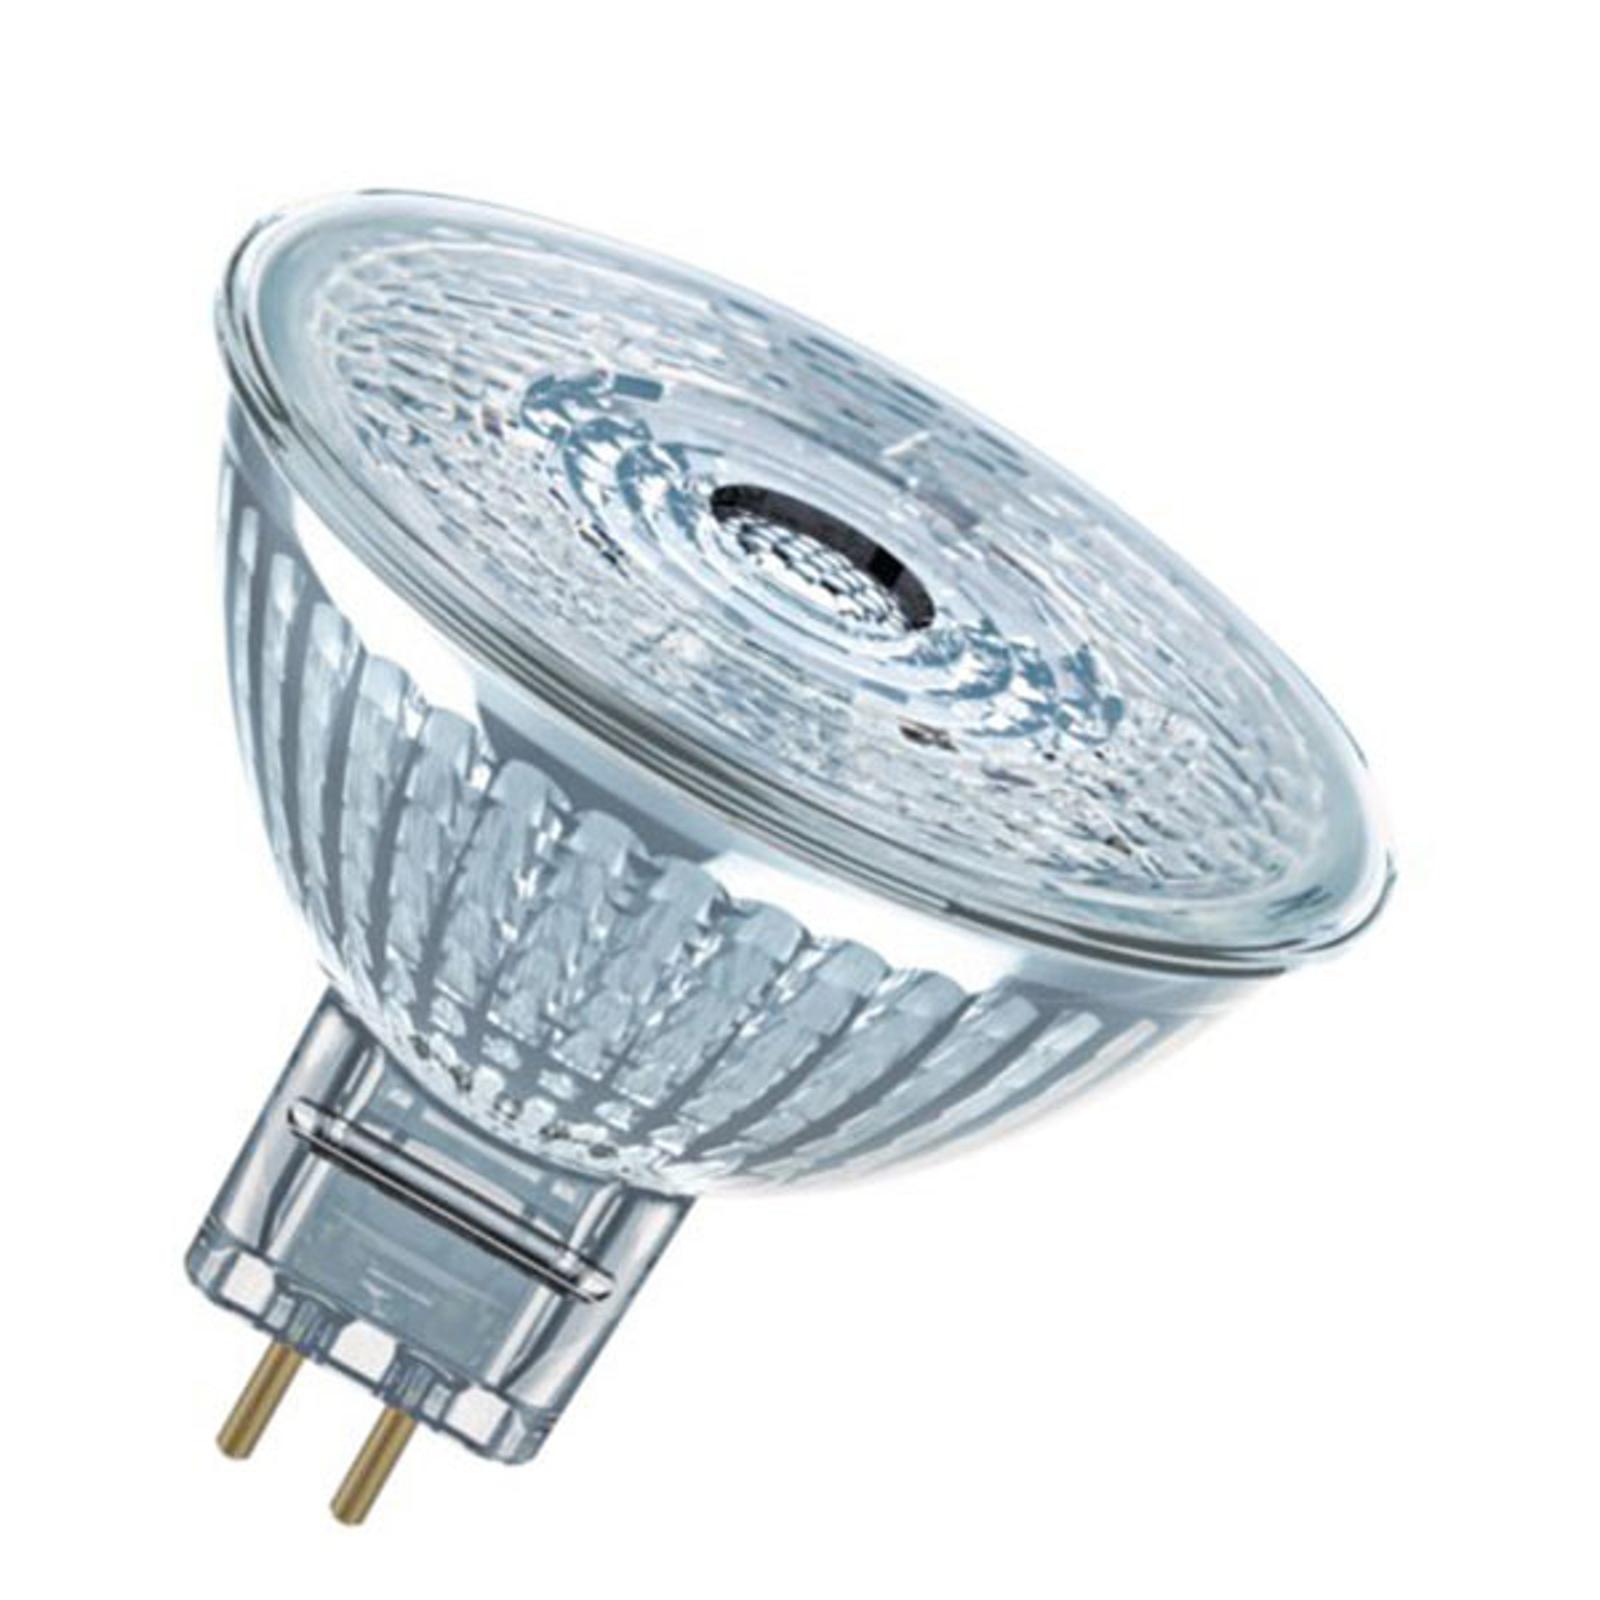 OSRAM LED-glassreflektor Star GU5,3 2,6 W 4000K